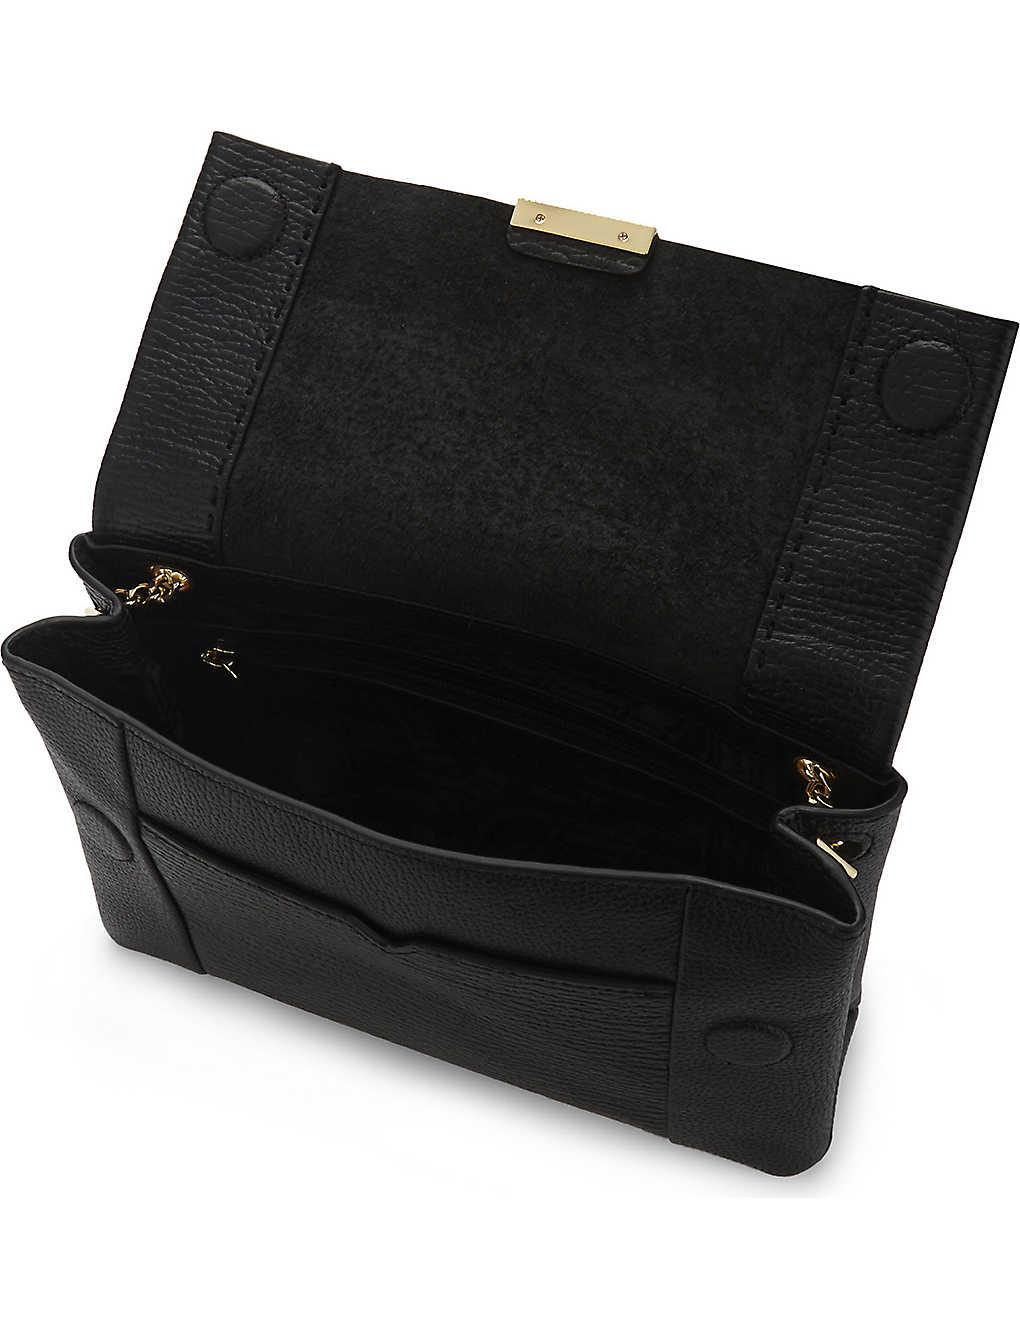 8a5c5a9144 TED BAKER - Parson leather cross-body bag | Selfridges.com